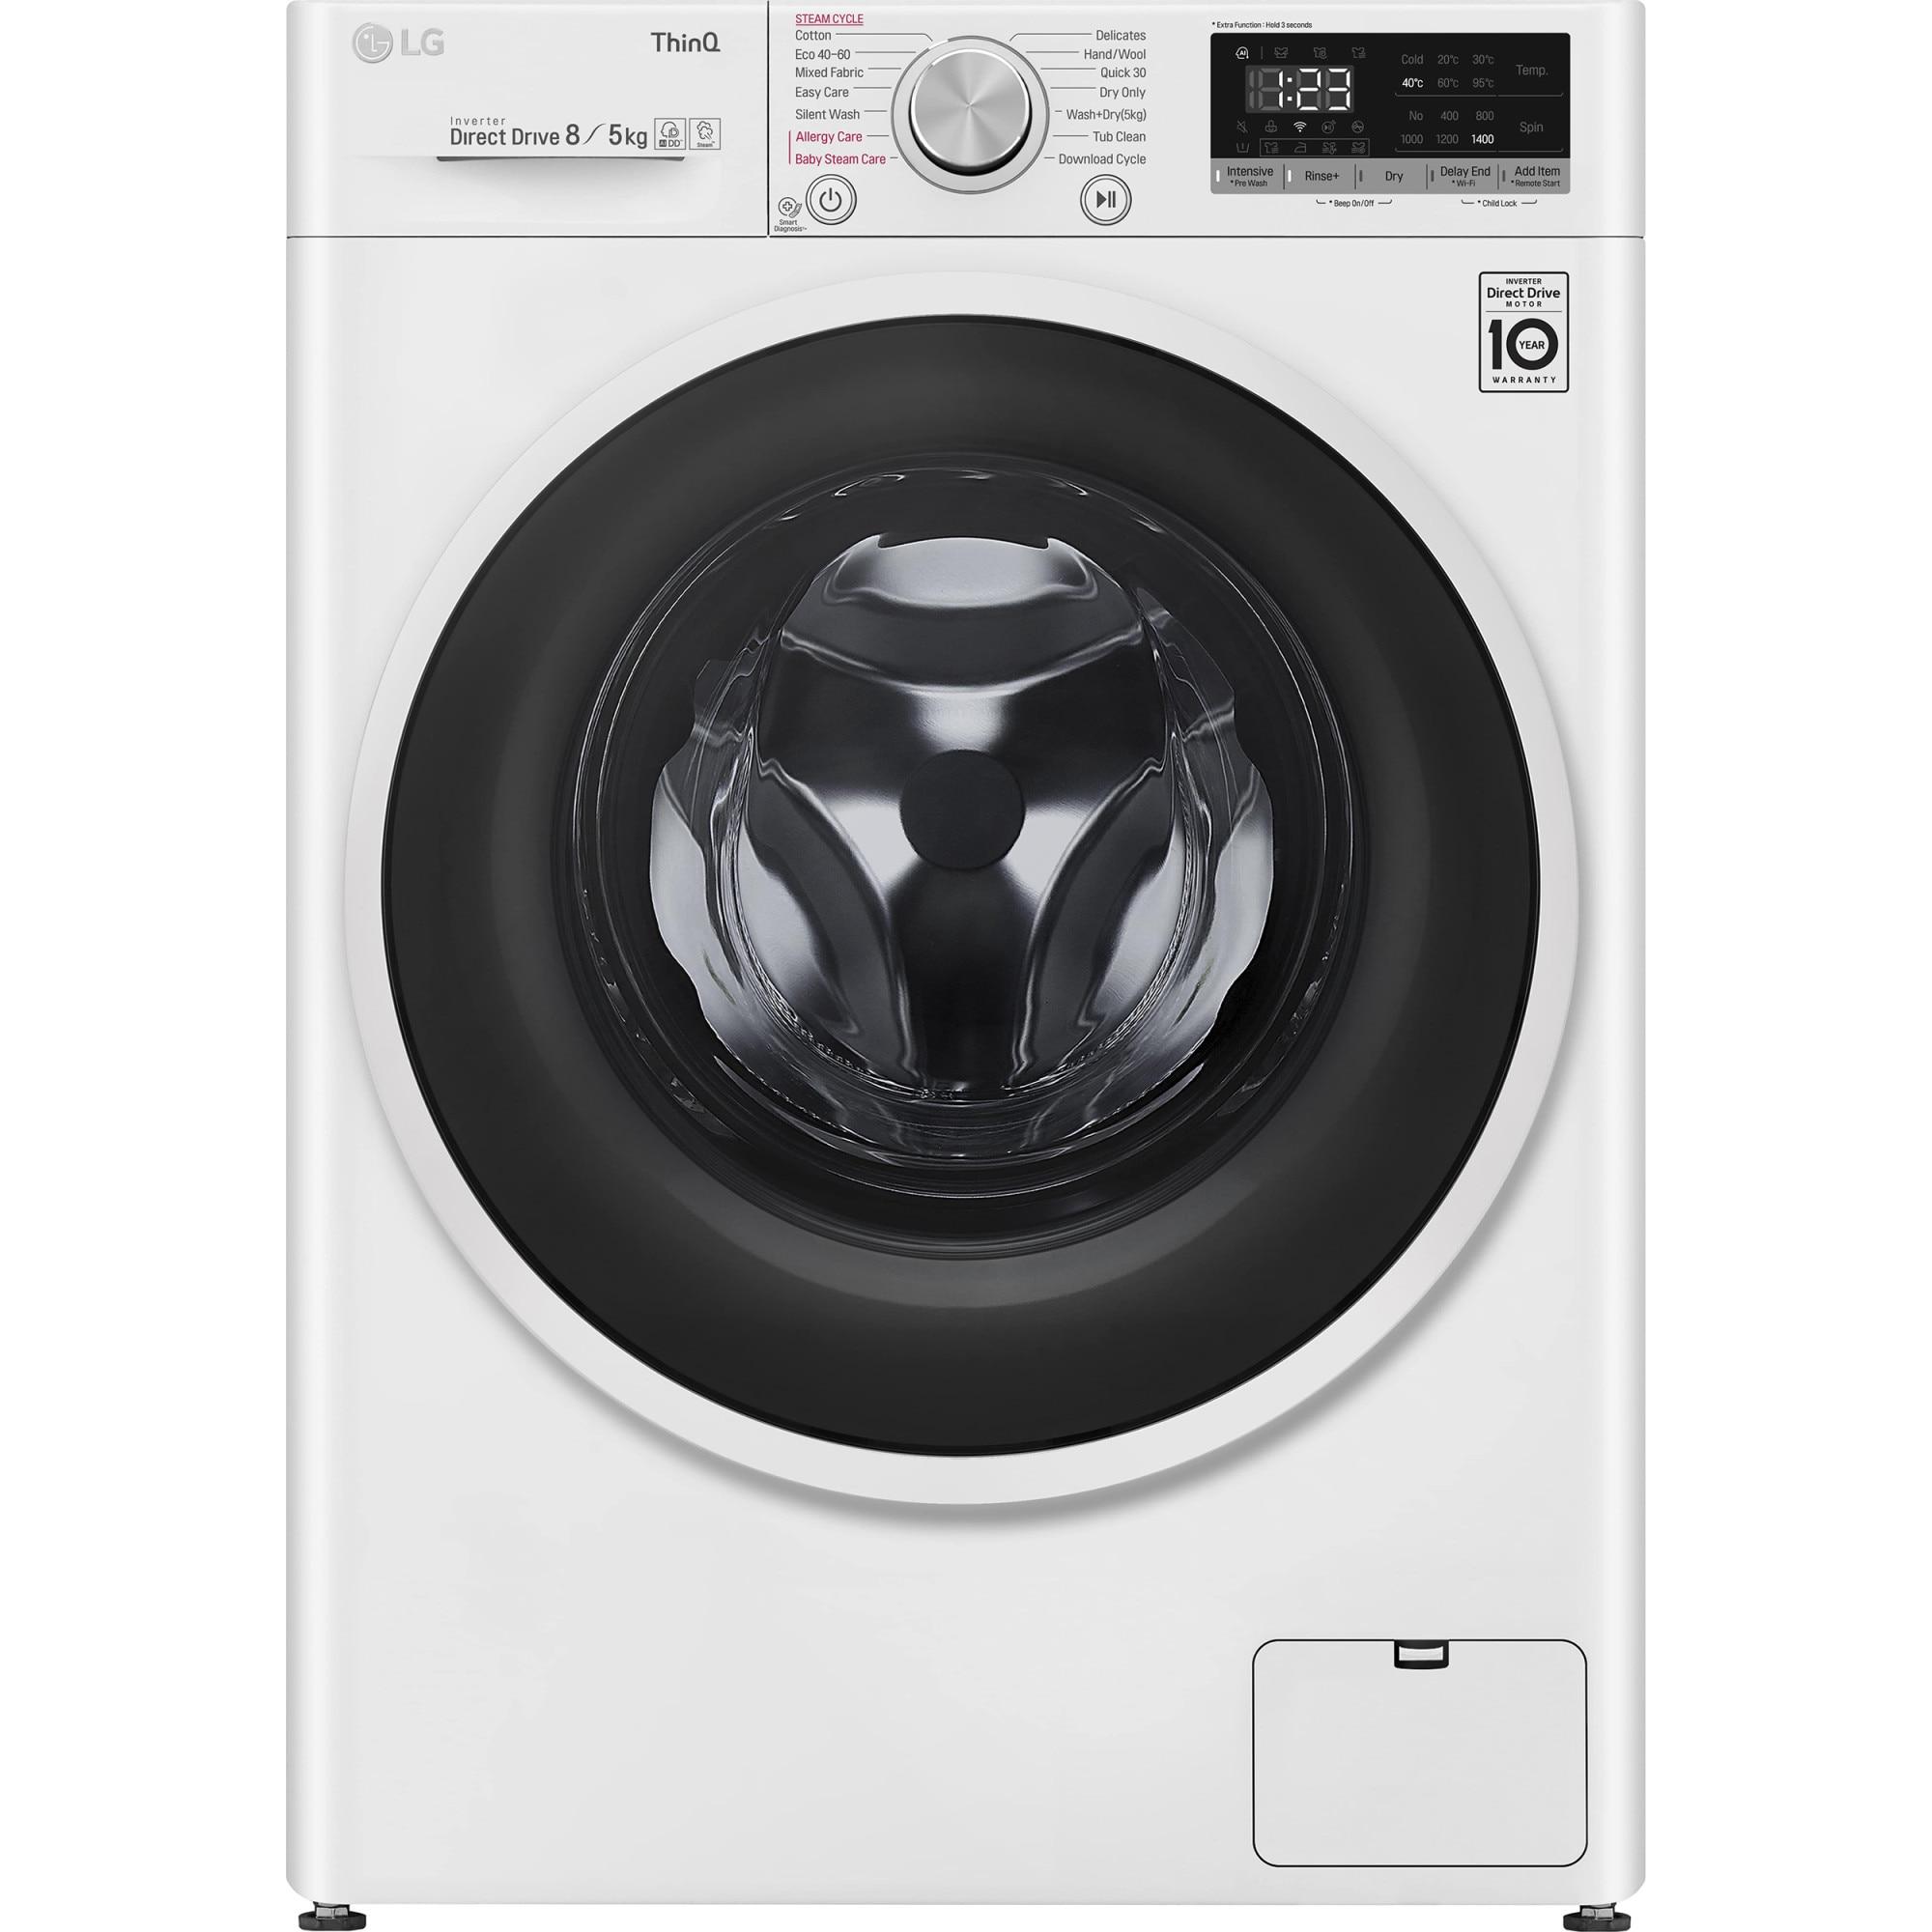 Fotografie Masina de spalat rufe cu uscator LG F4DT408AIDD, Spalare 8 kg, Uscare 5 kg, 1400 RPM, Clasa A, AI Direct Drive, Steam, Smart Diagnosis, WiFi, Alb